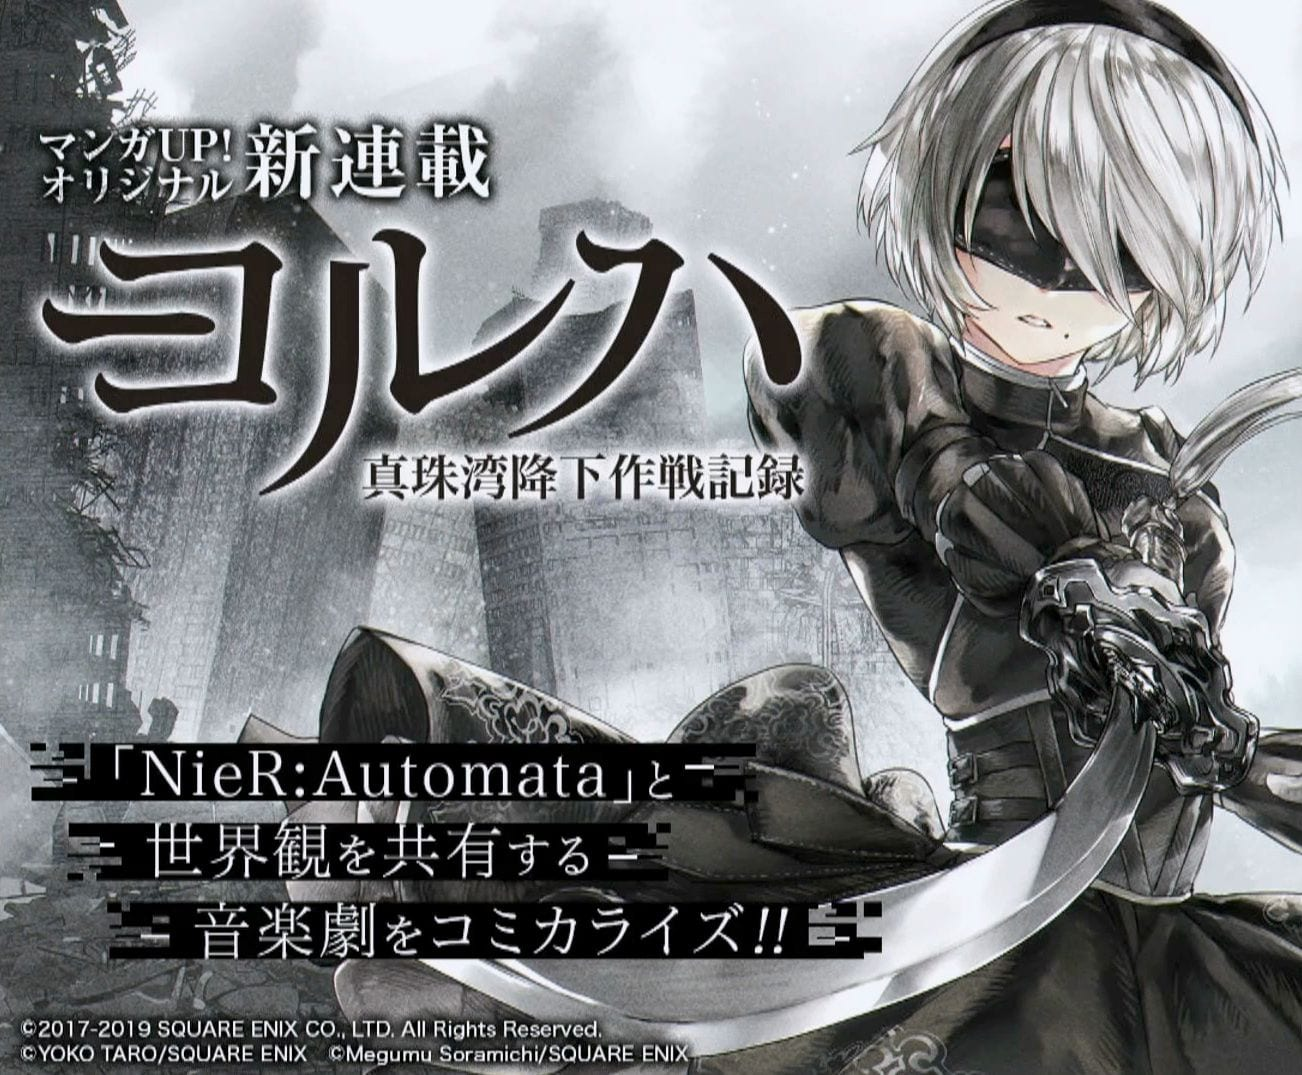 NieR: Automata Has Shipped Over 5 Million Copies; Manga Introduced 2